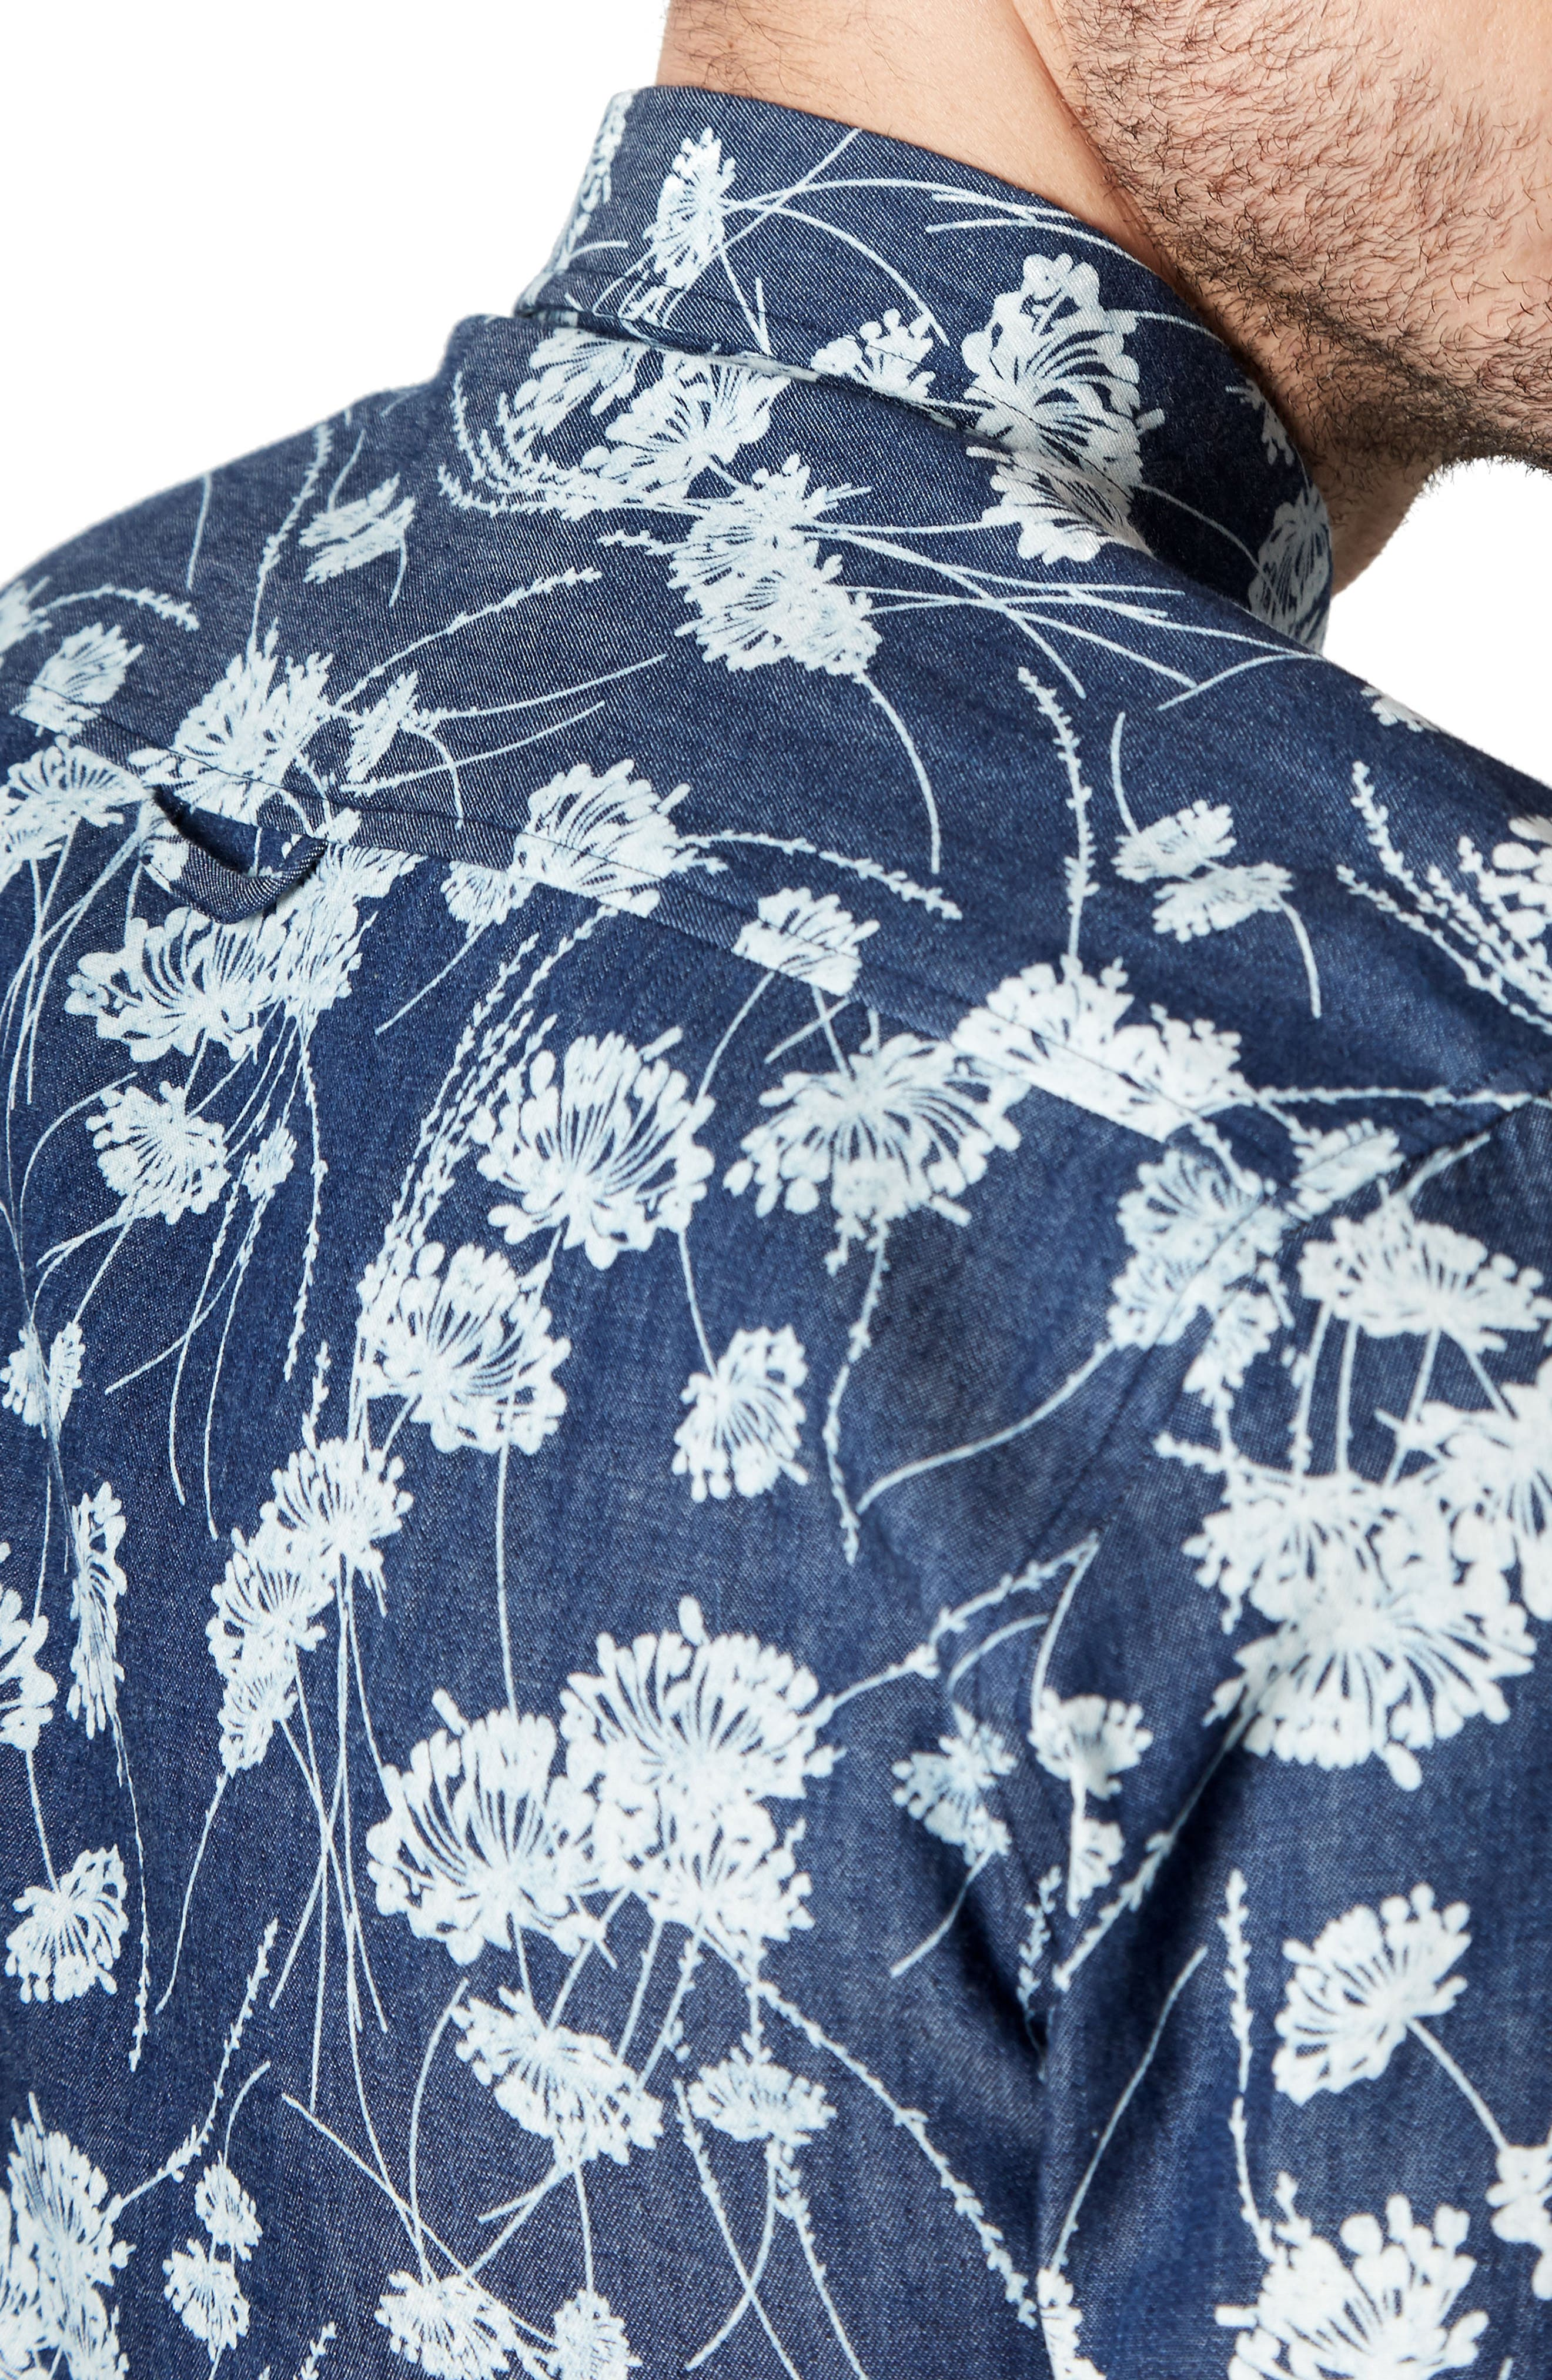 Twist of Faith Woven Shirt,                             Alternate thumbnail 4, color,                             Blue